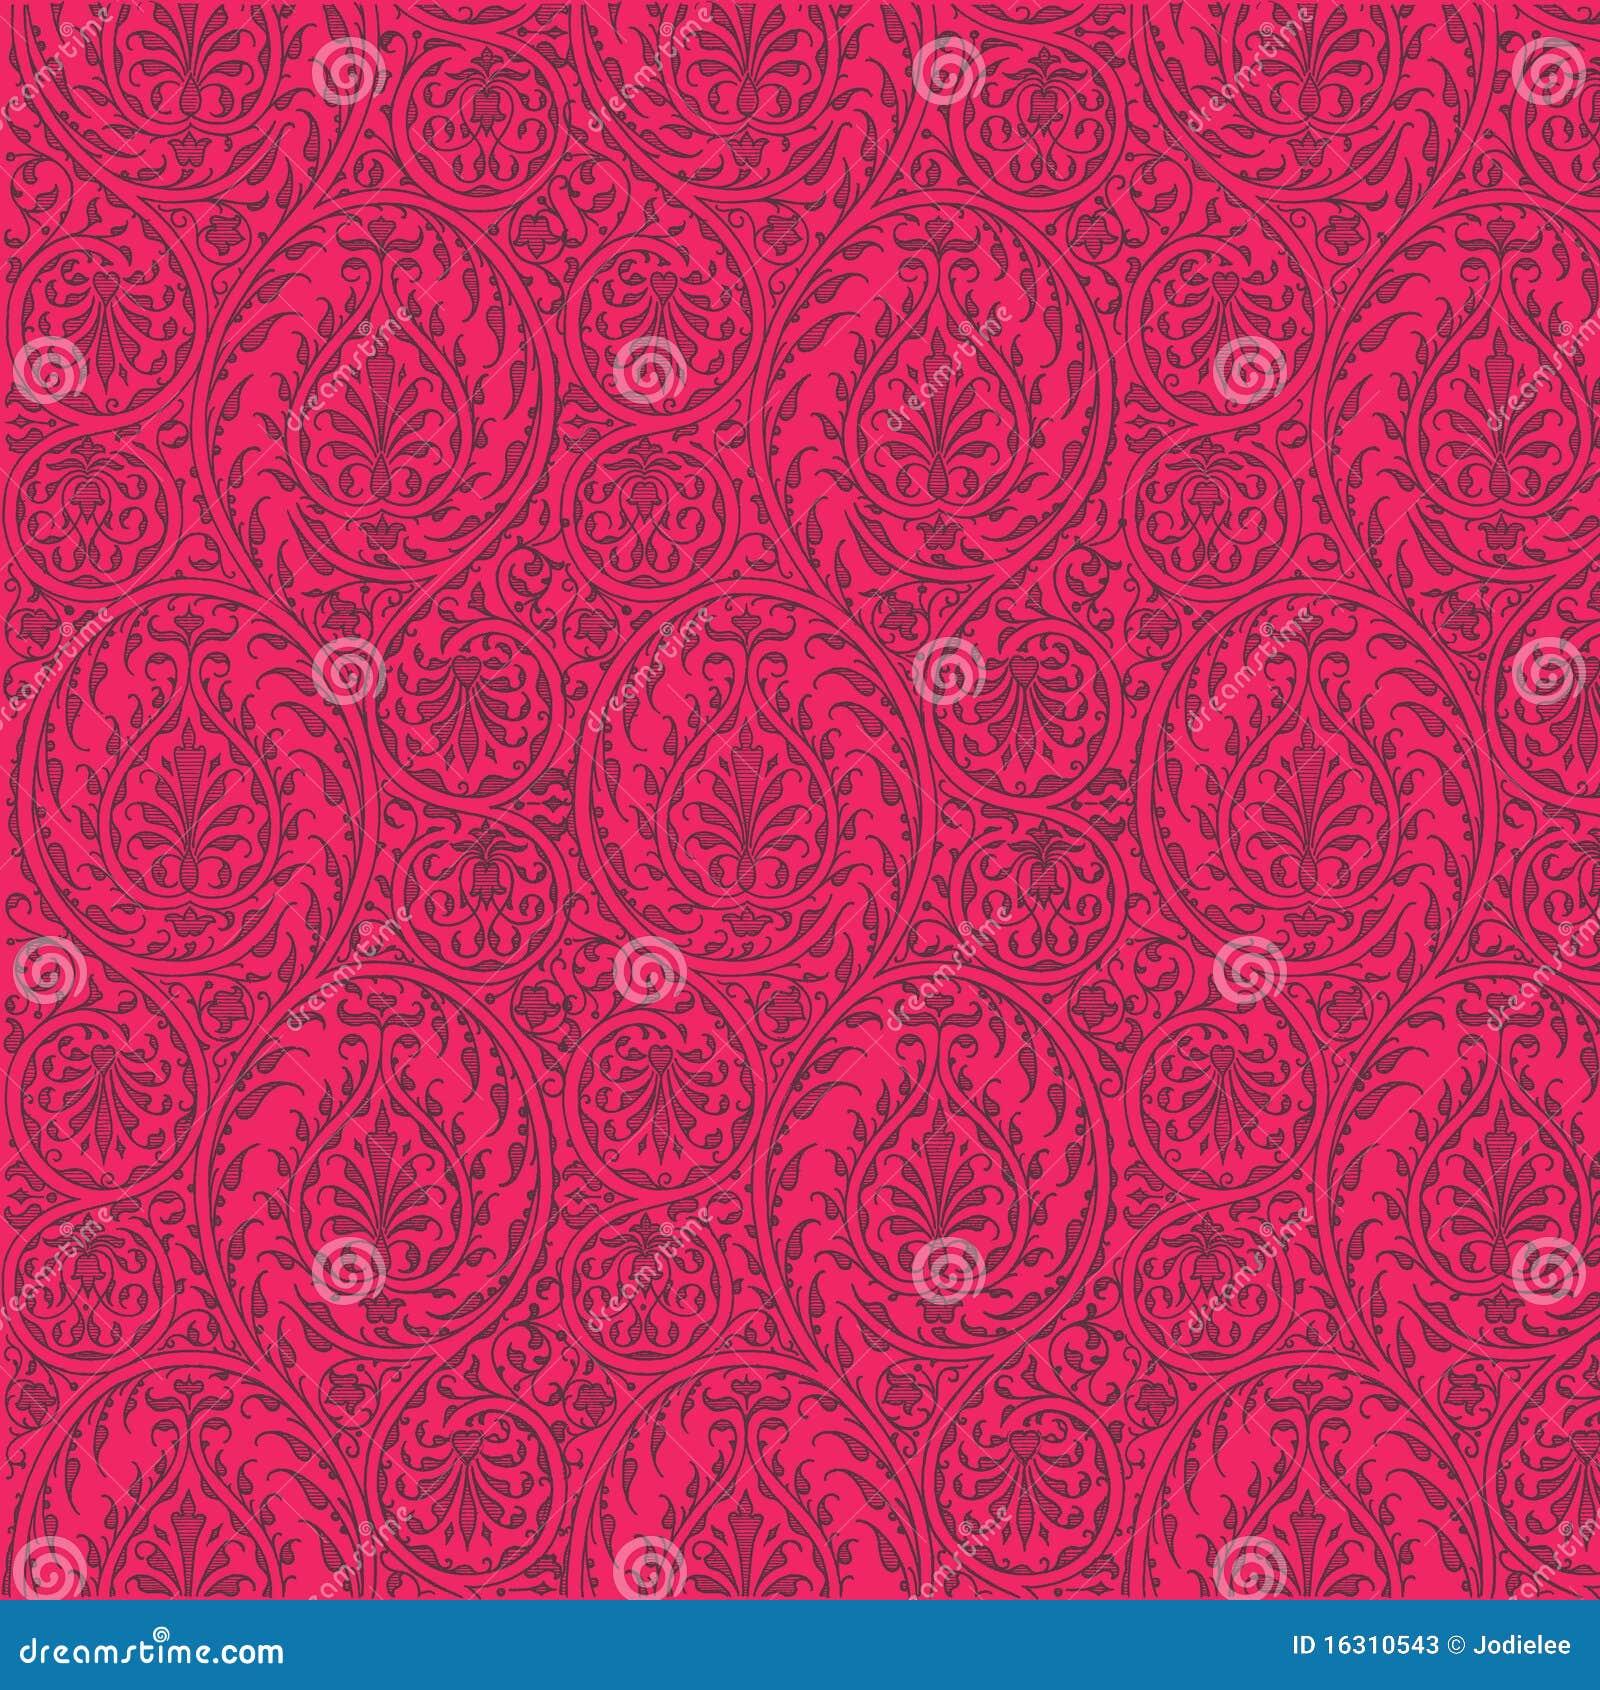 hot pink paisley background - photo #3